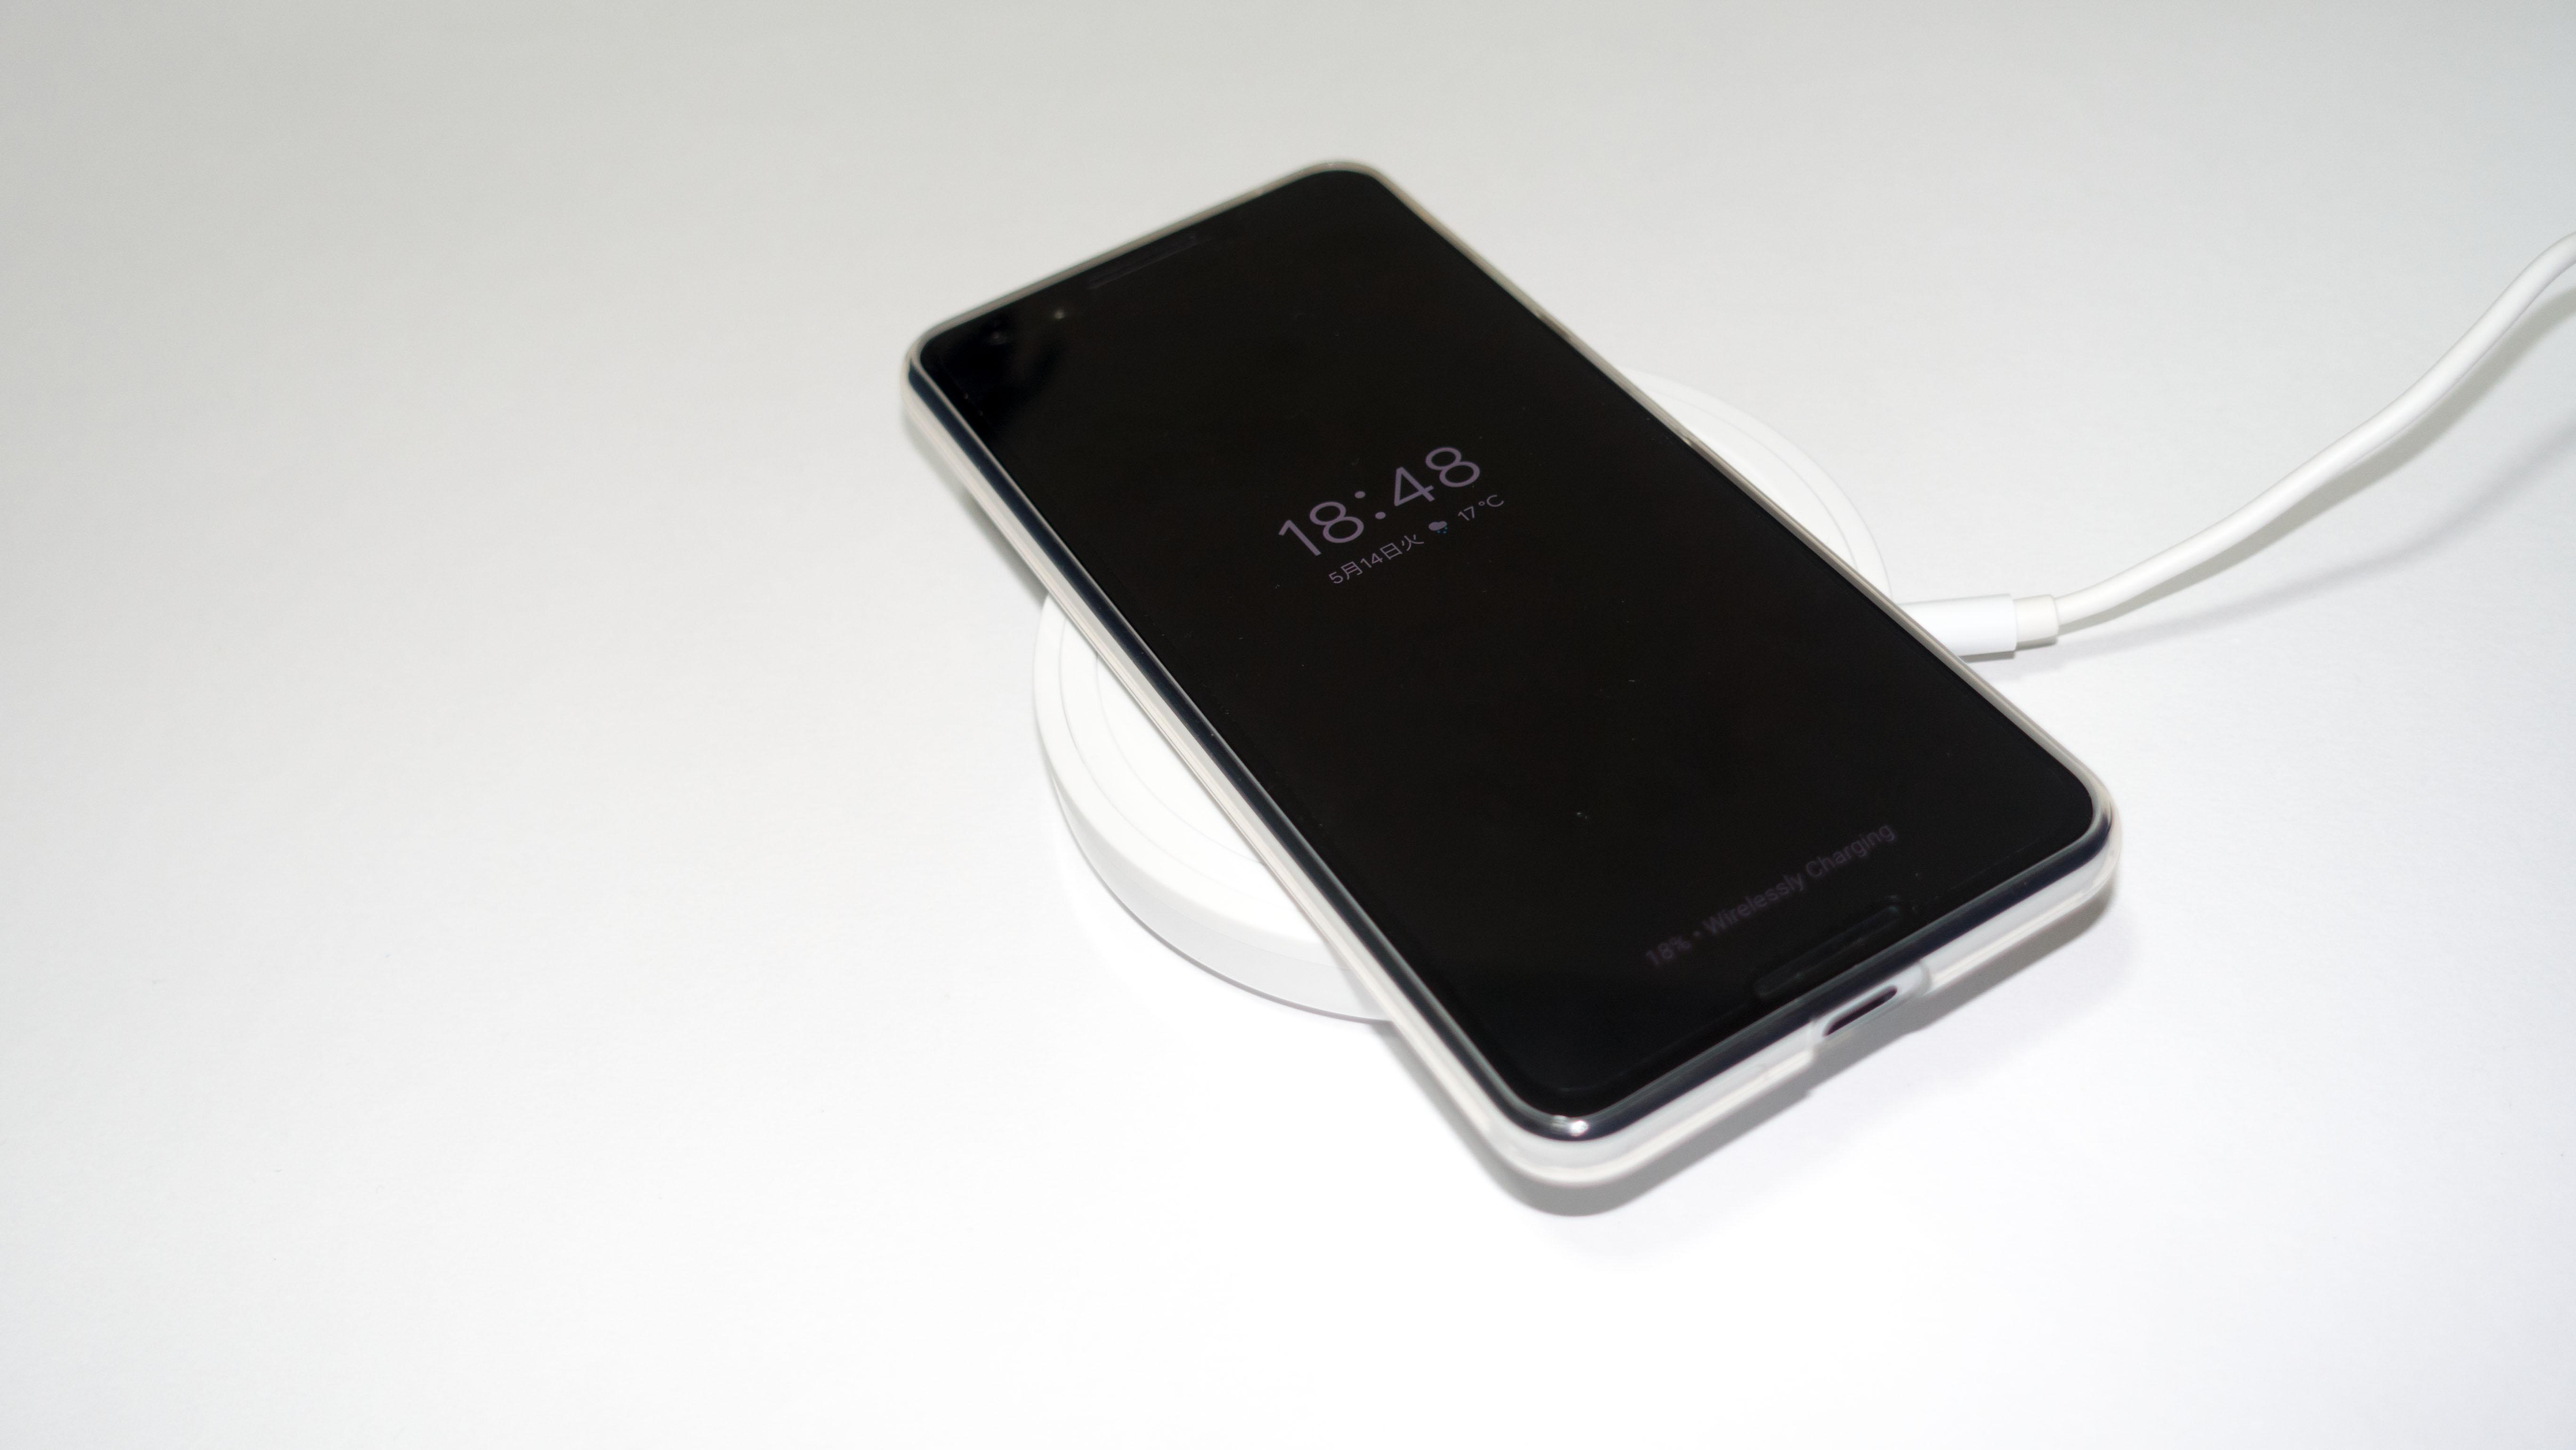 Pixel 3 / 3 XL用のワイヤレス急速充電は国内では「PixelStand」のみなので注意を